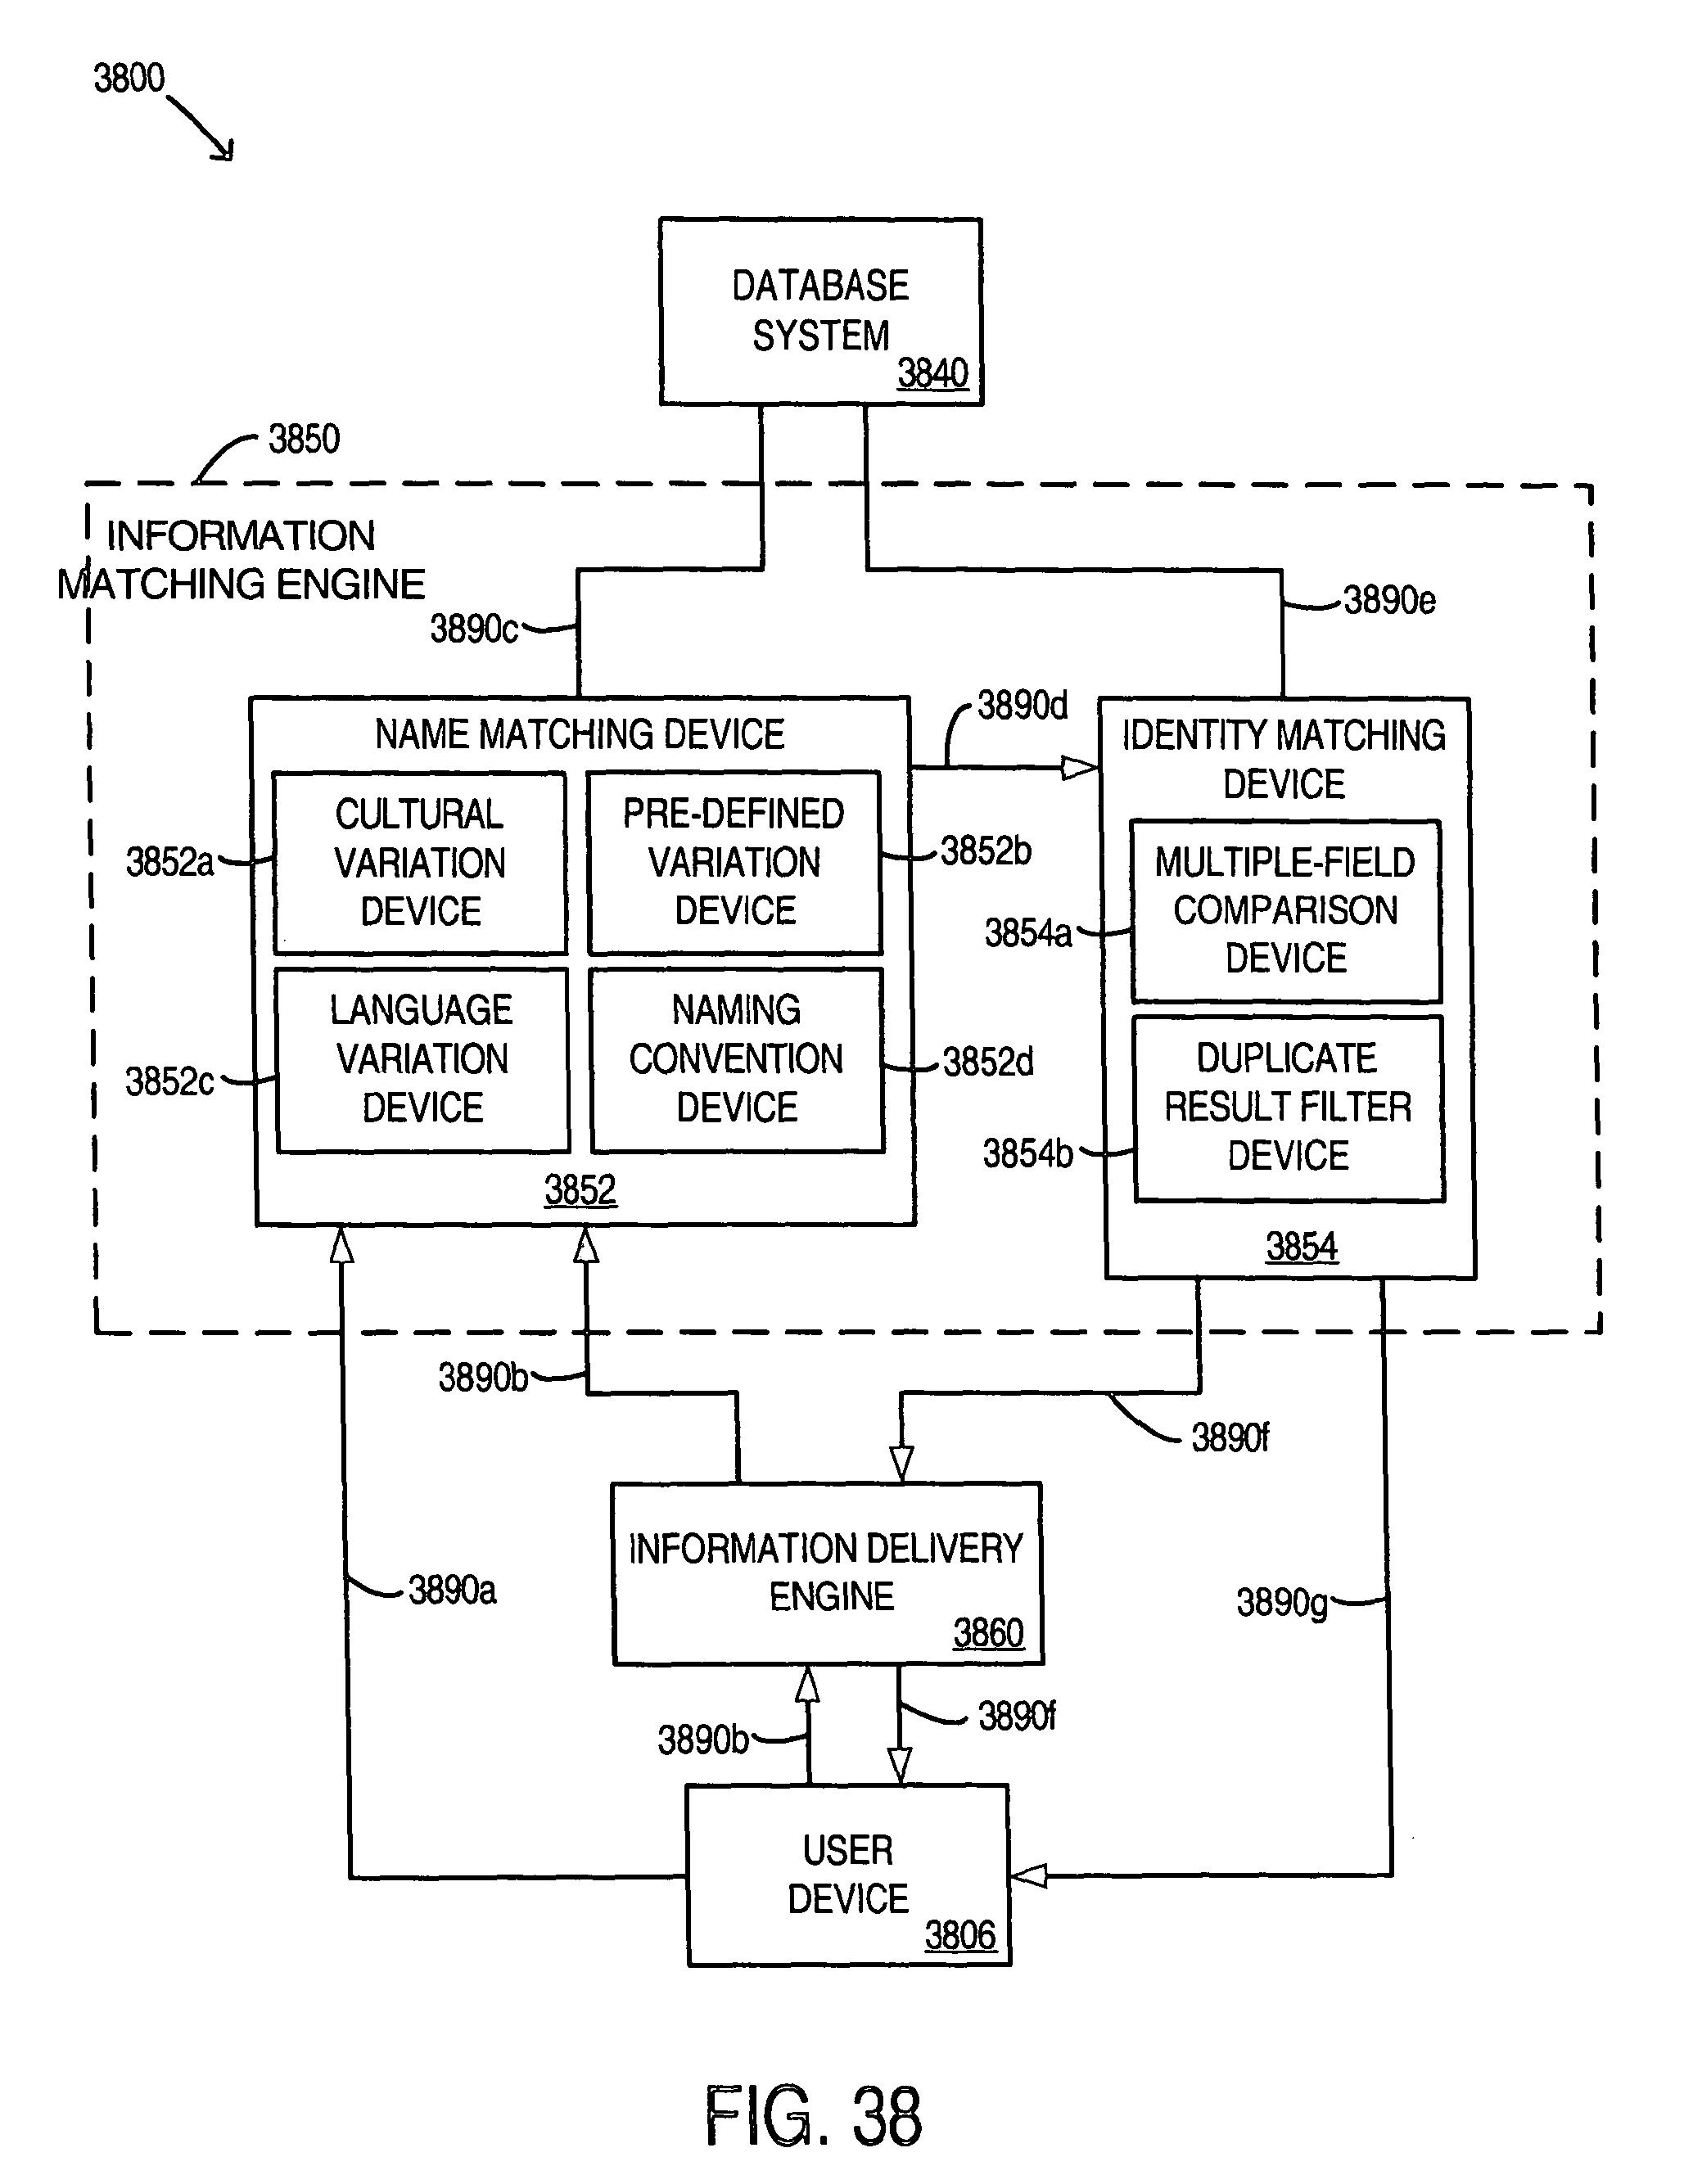 Patent US 9,058,581 B2